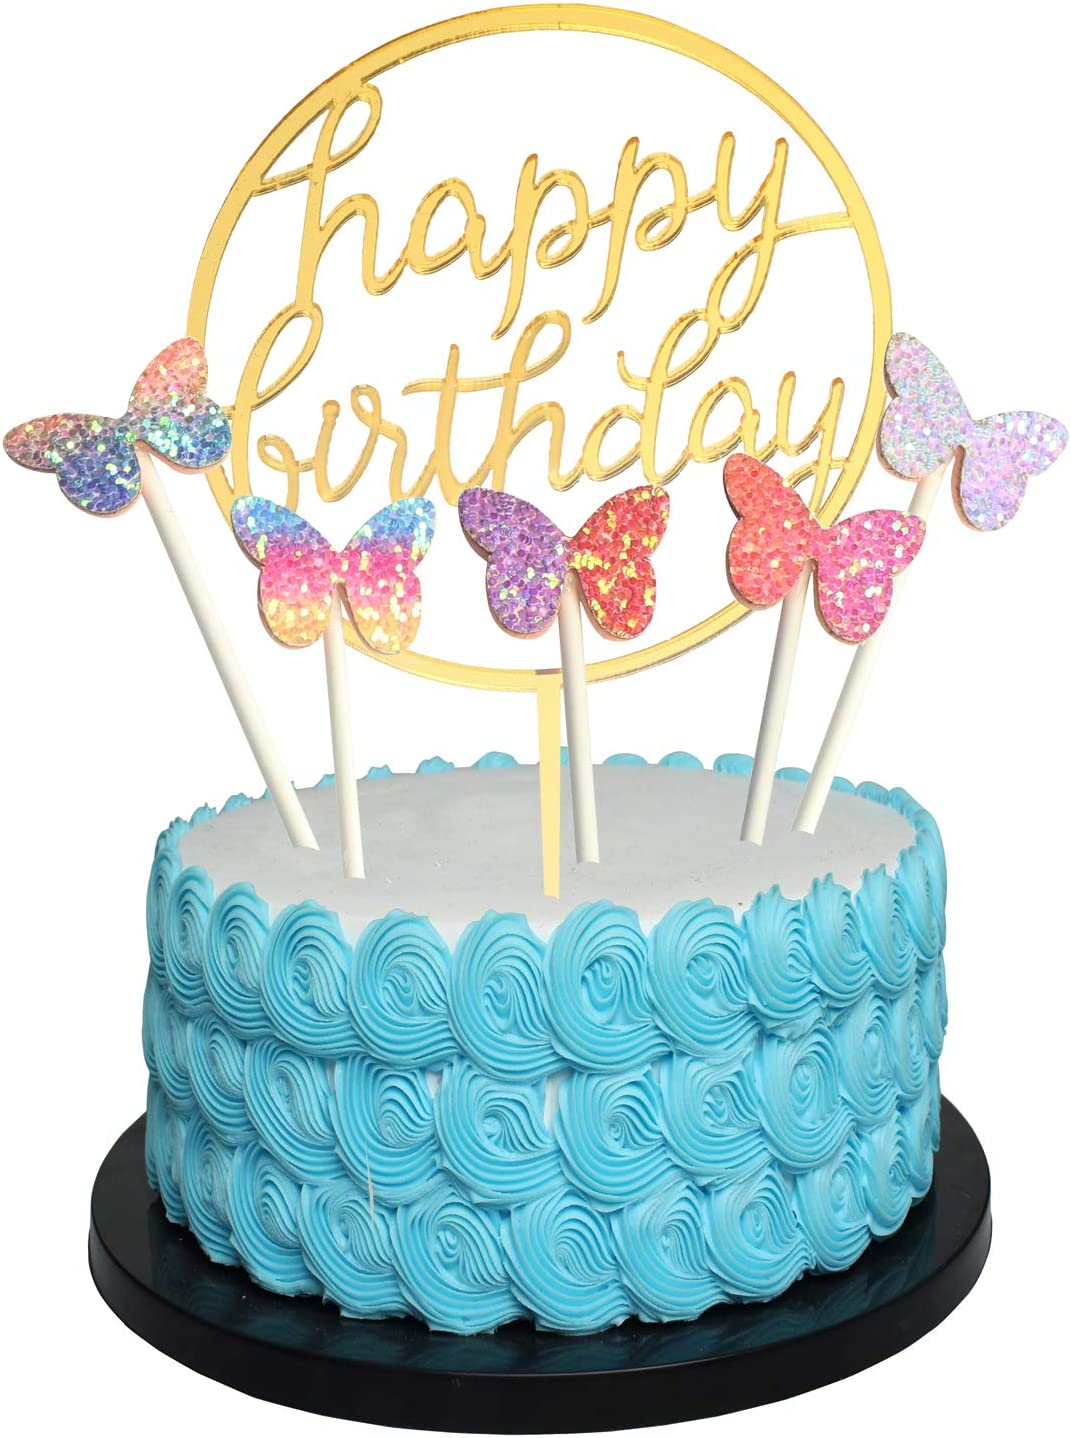 Tremendous Amazon Com Happy Birthday Cake Topper Acrylic Gold Twinkle Diy Birthday Cards Printable Benkemecafe Filternl